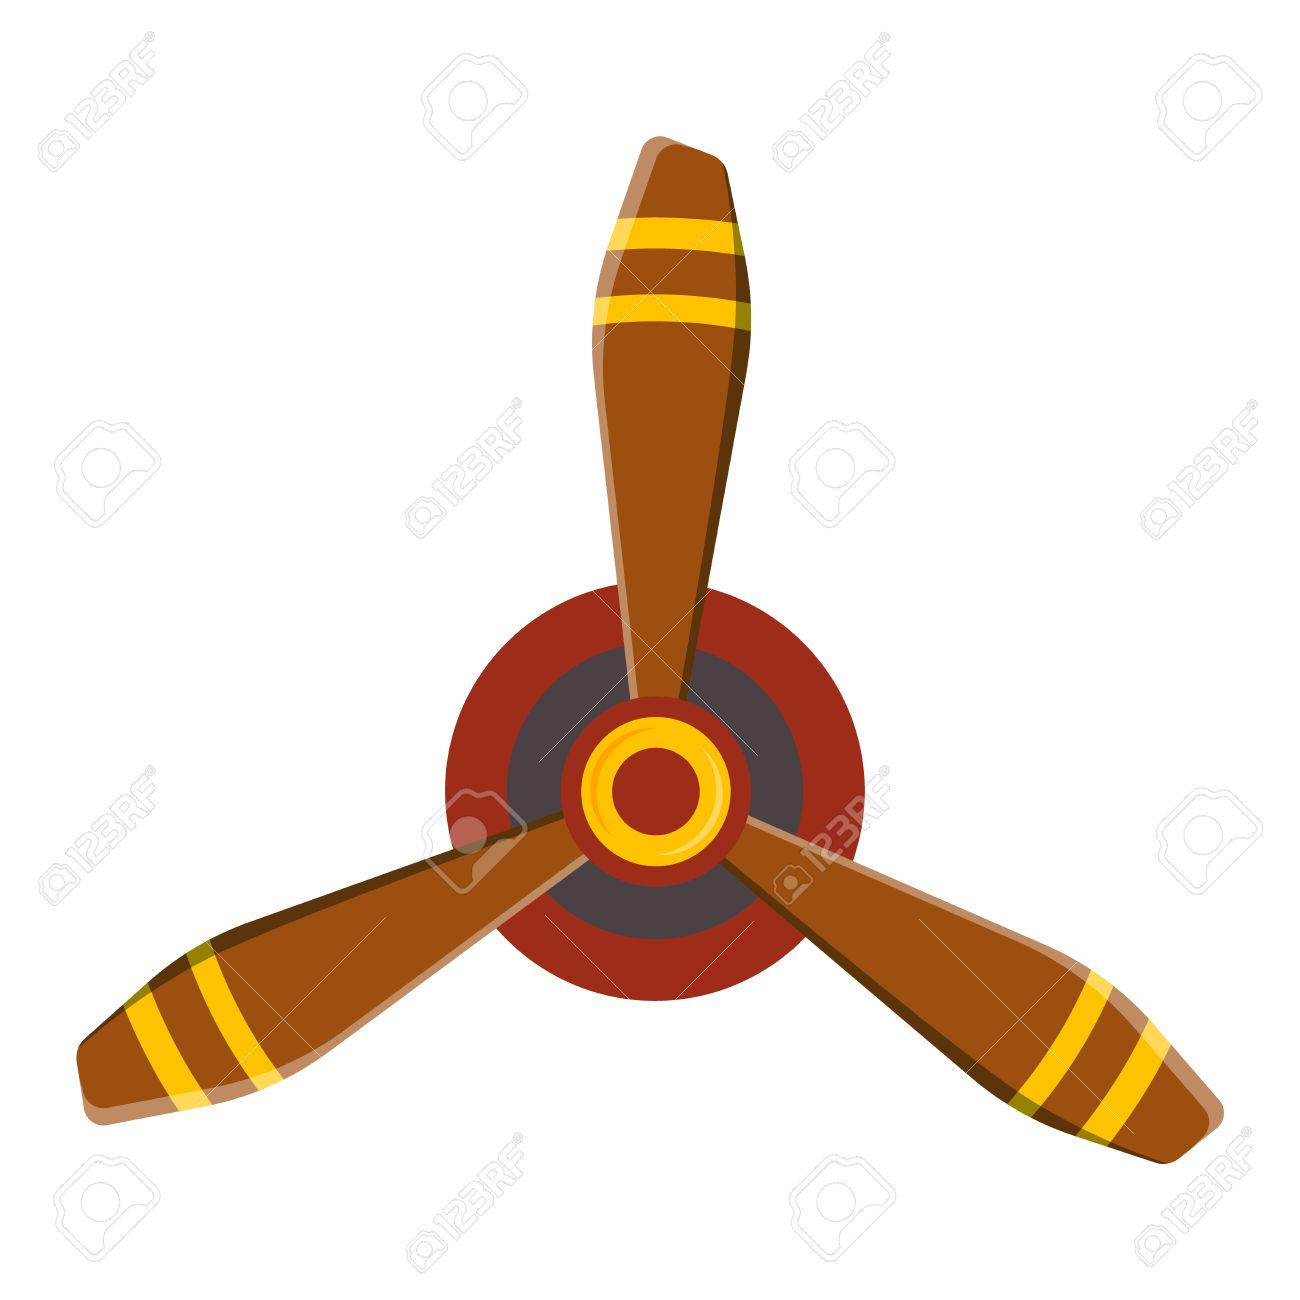 Turbine Plane Icon Propeller Fan Rotation Technology Equipment.